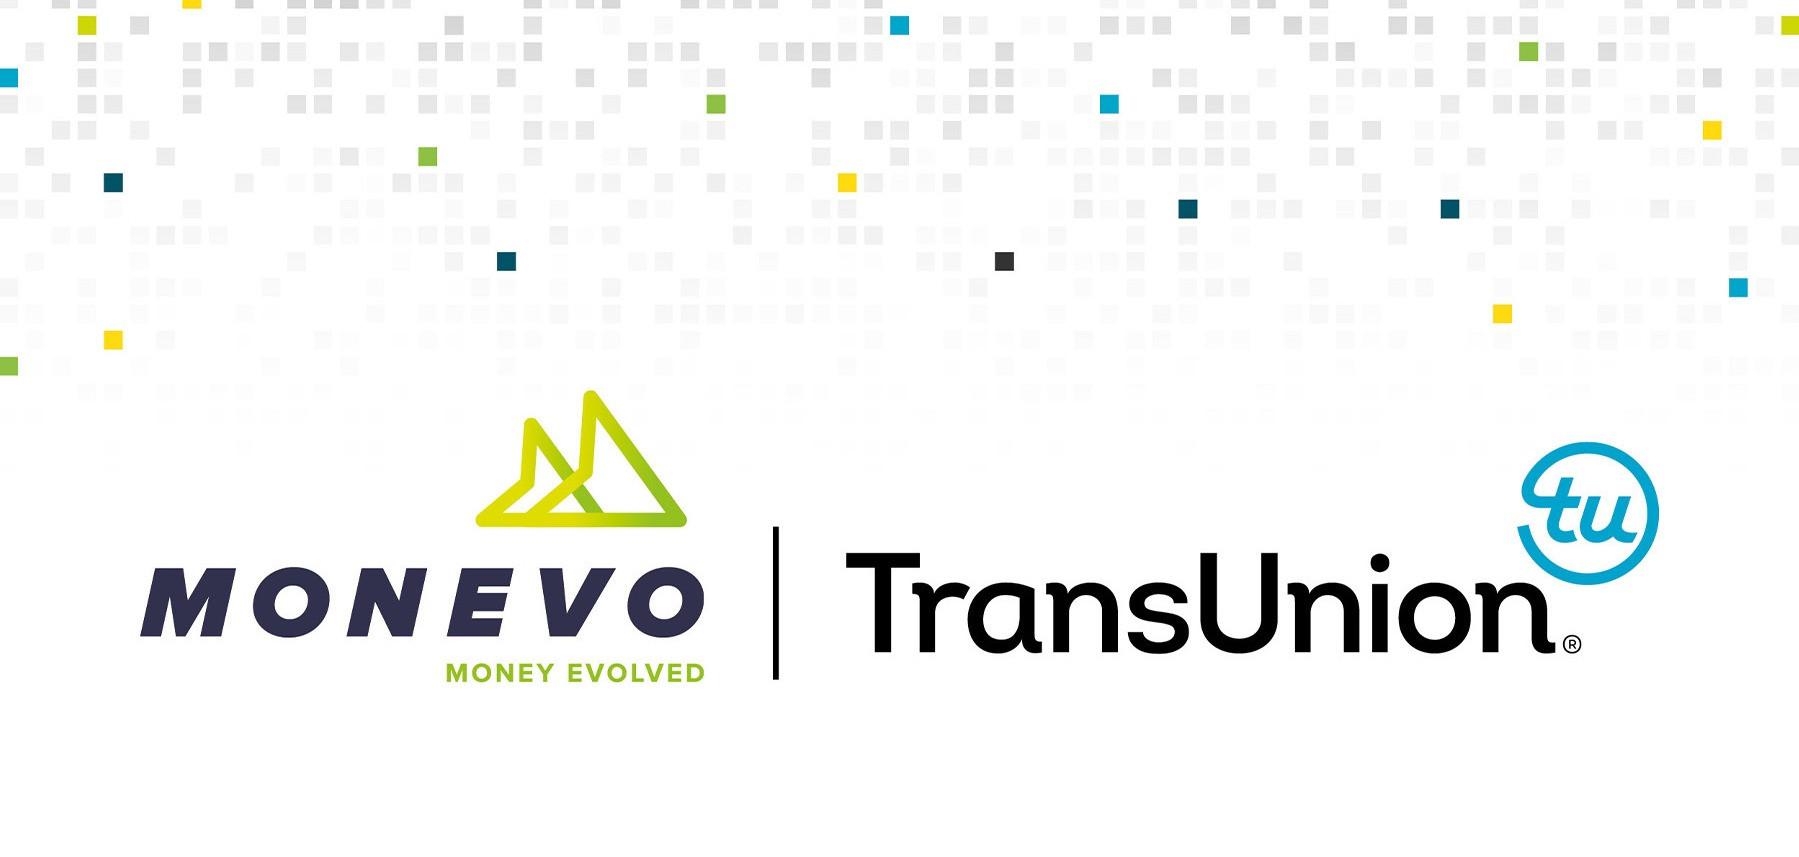 TransUnion Invests in Monevo to Serve the Personal Credit Market